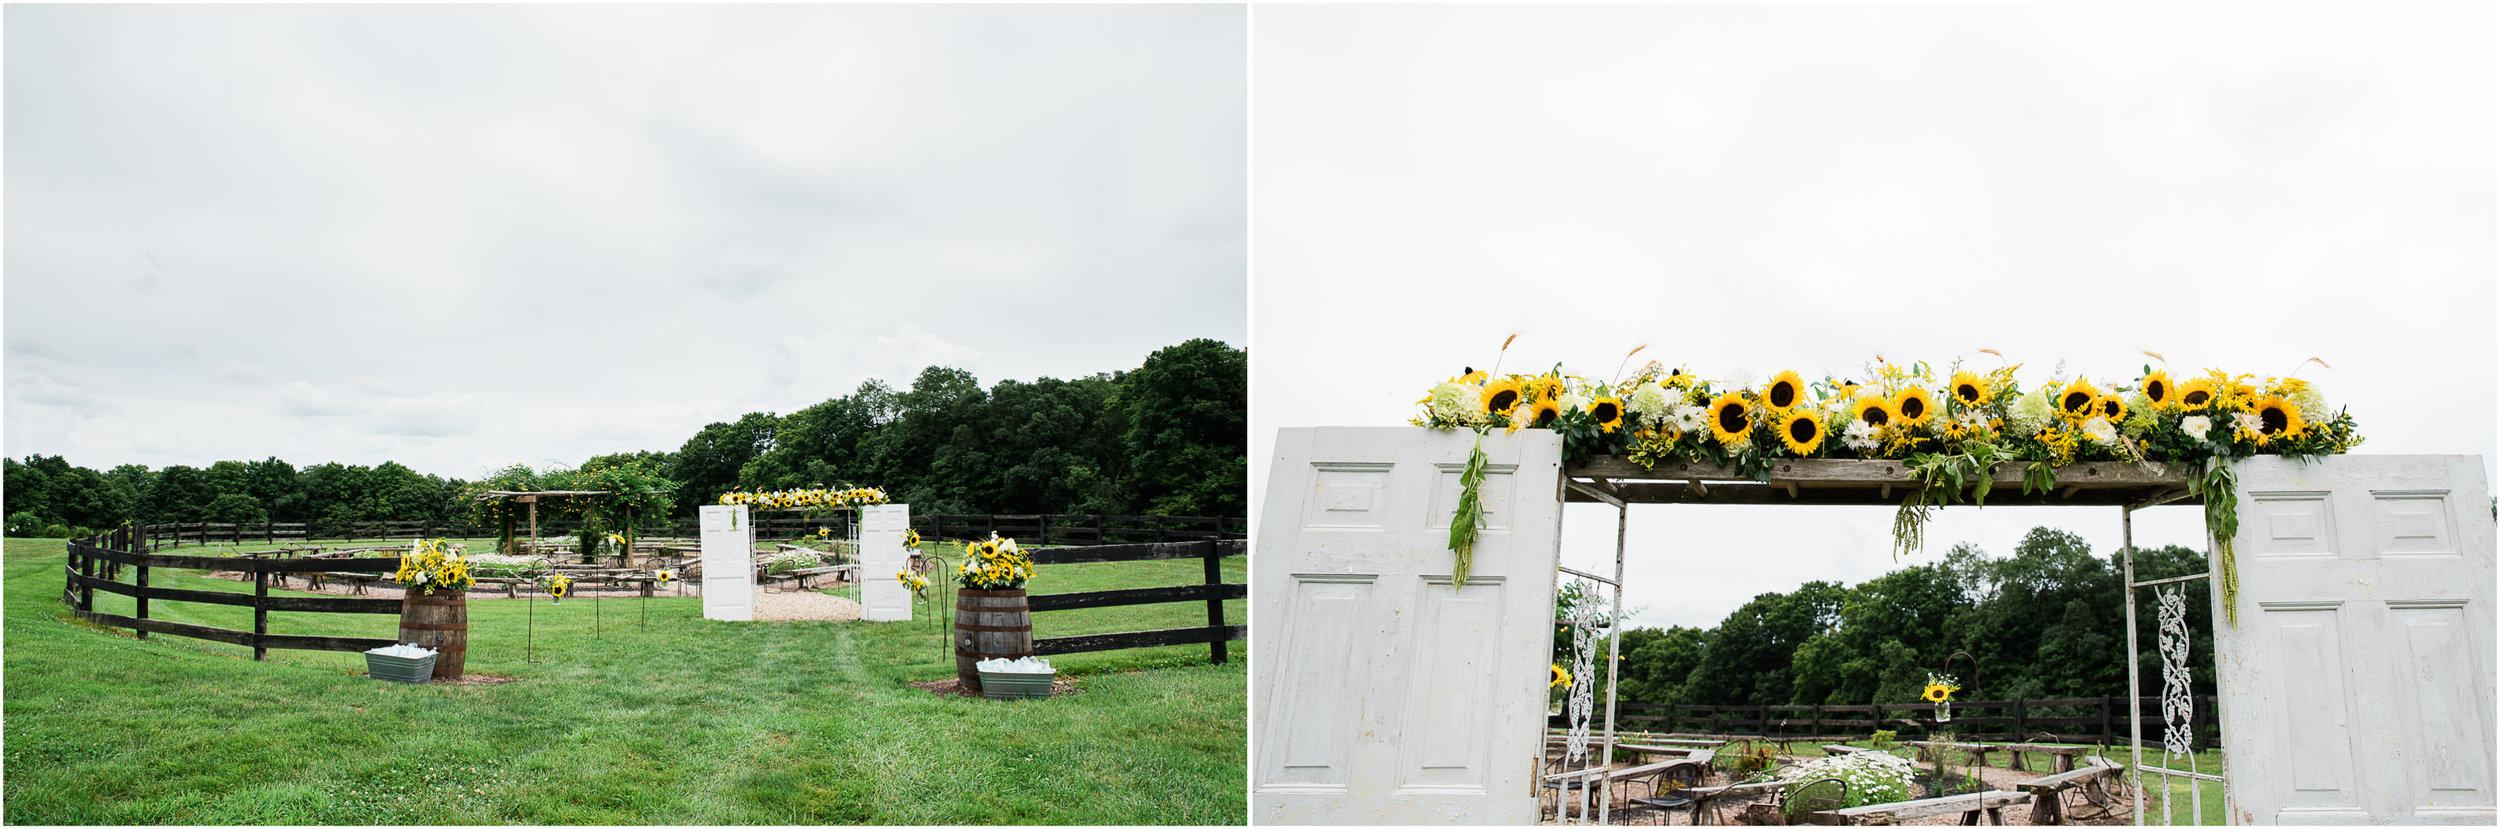 Wedding decorations, The Hayloft of PA.jpg